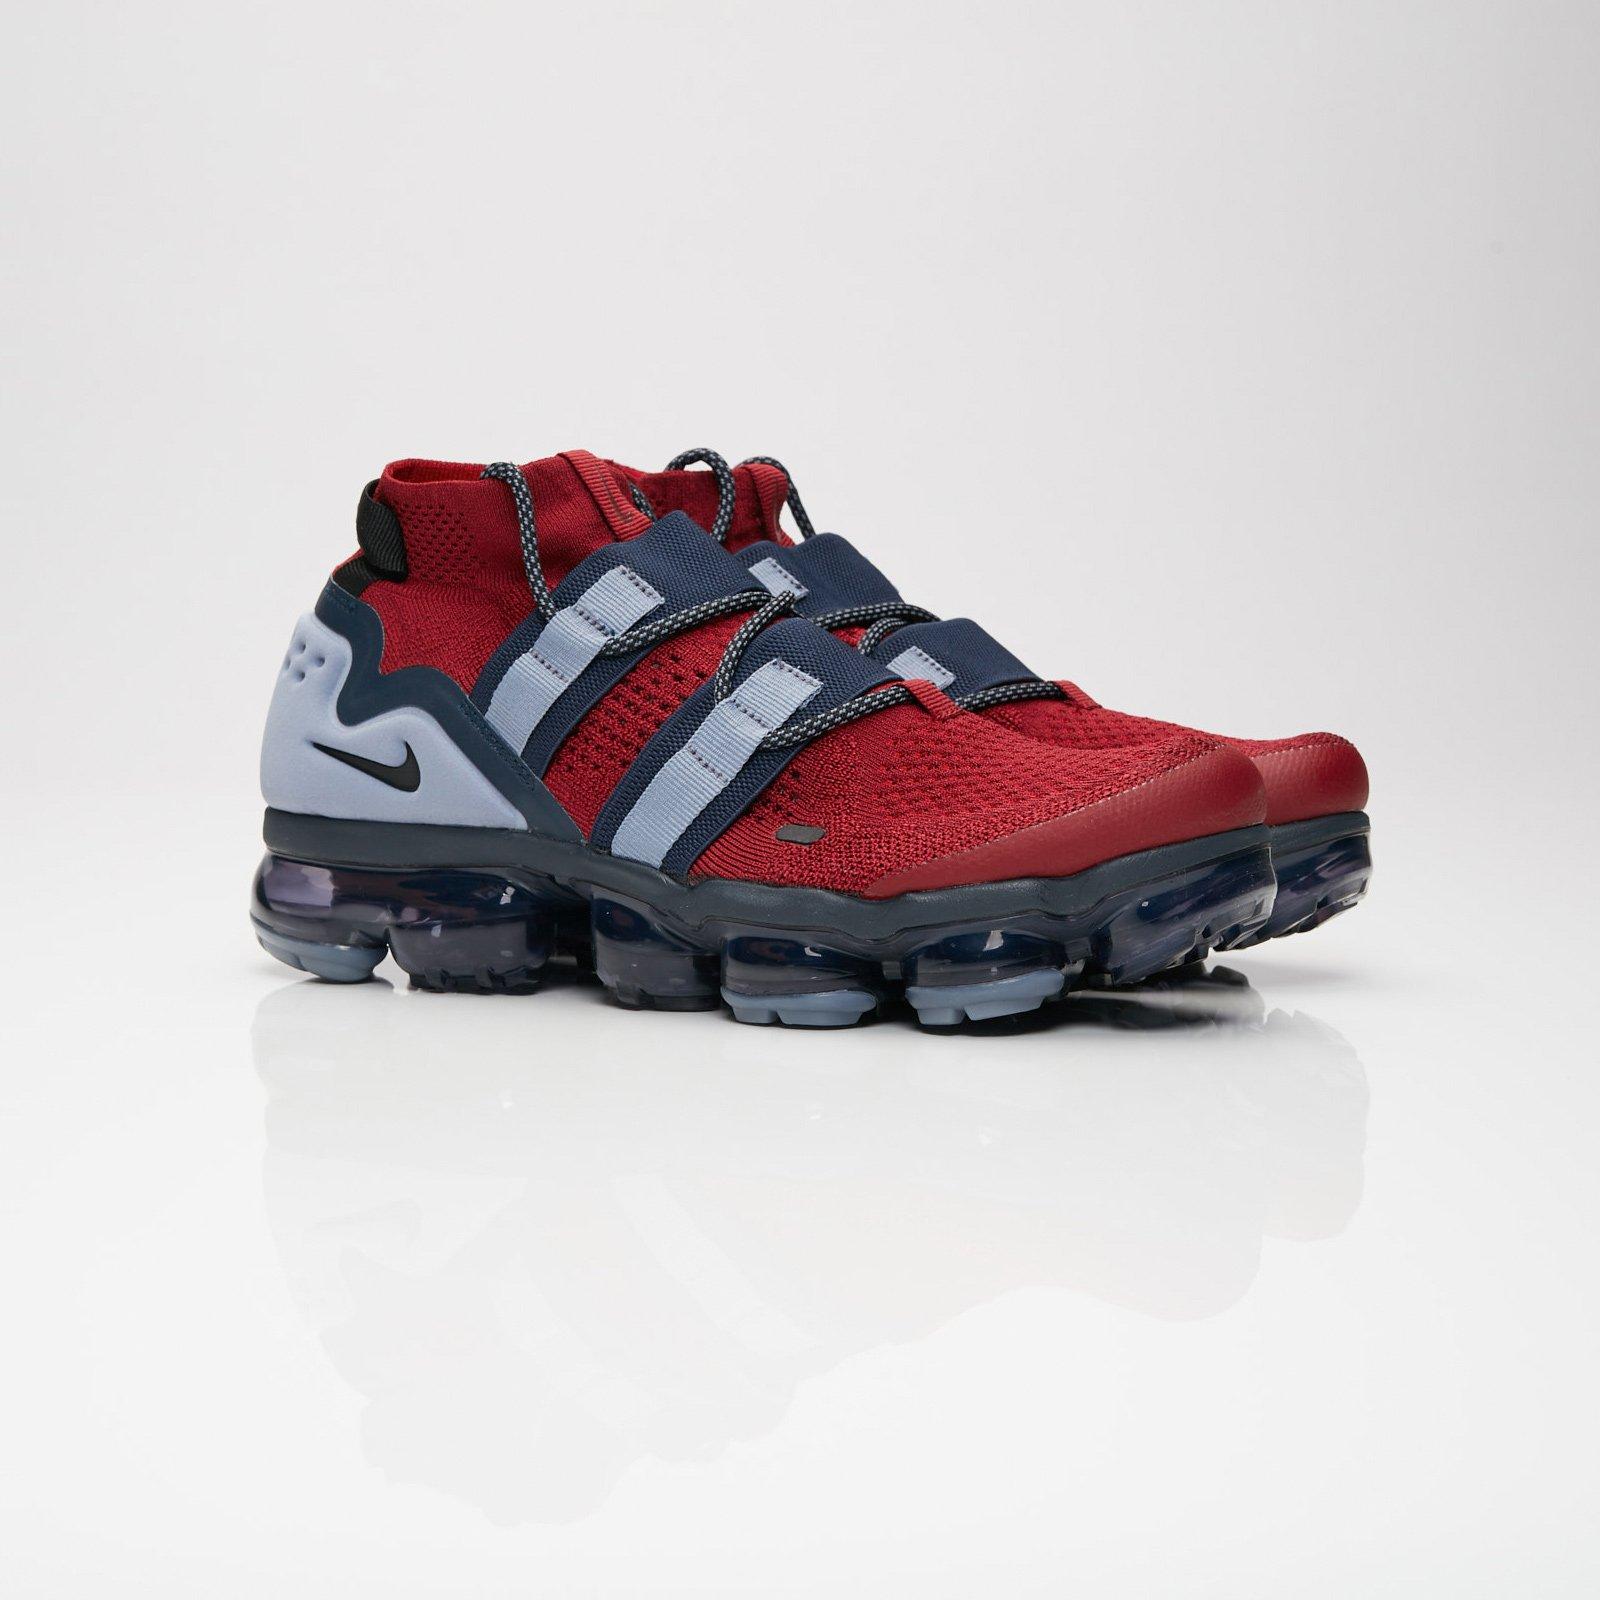 a7ca0344843a1 Nike Air Vapormax FK Utility - Ah6834-600 - Sneakersnstuff ...